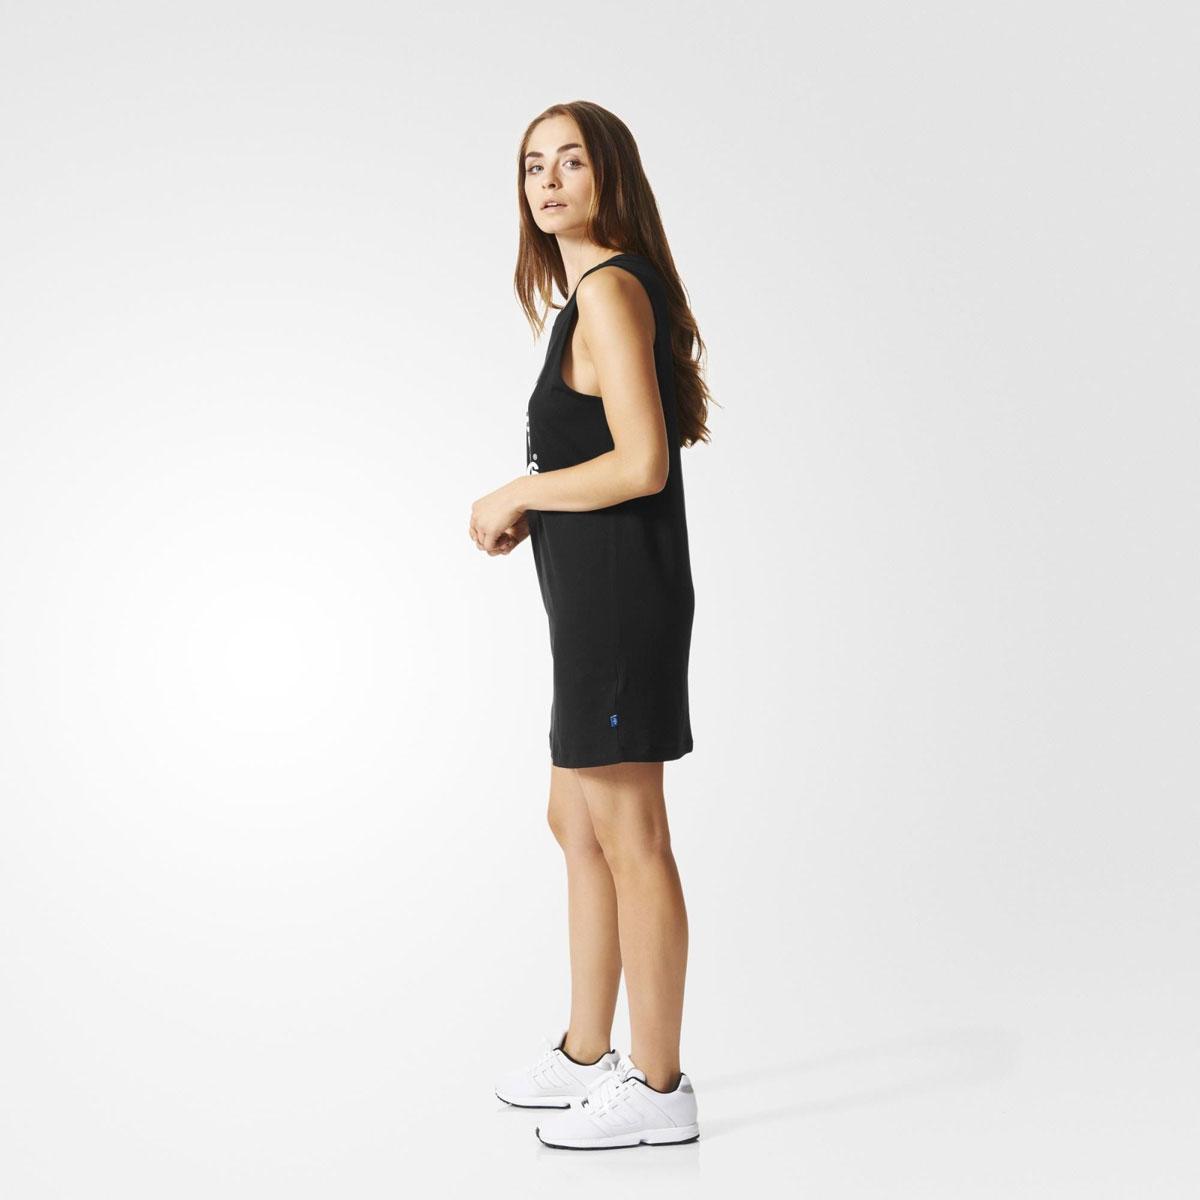 Adidas Originals TRF TANK DRESS (아디다스 オリジナルス 클로버 탱크 드레스) BLACK 16SS-I